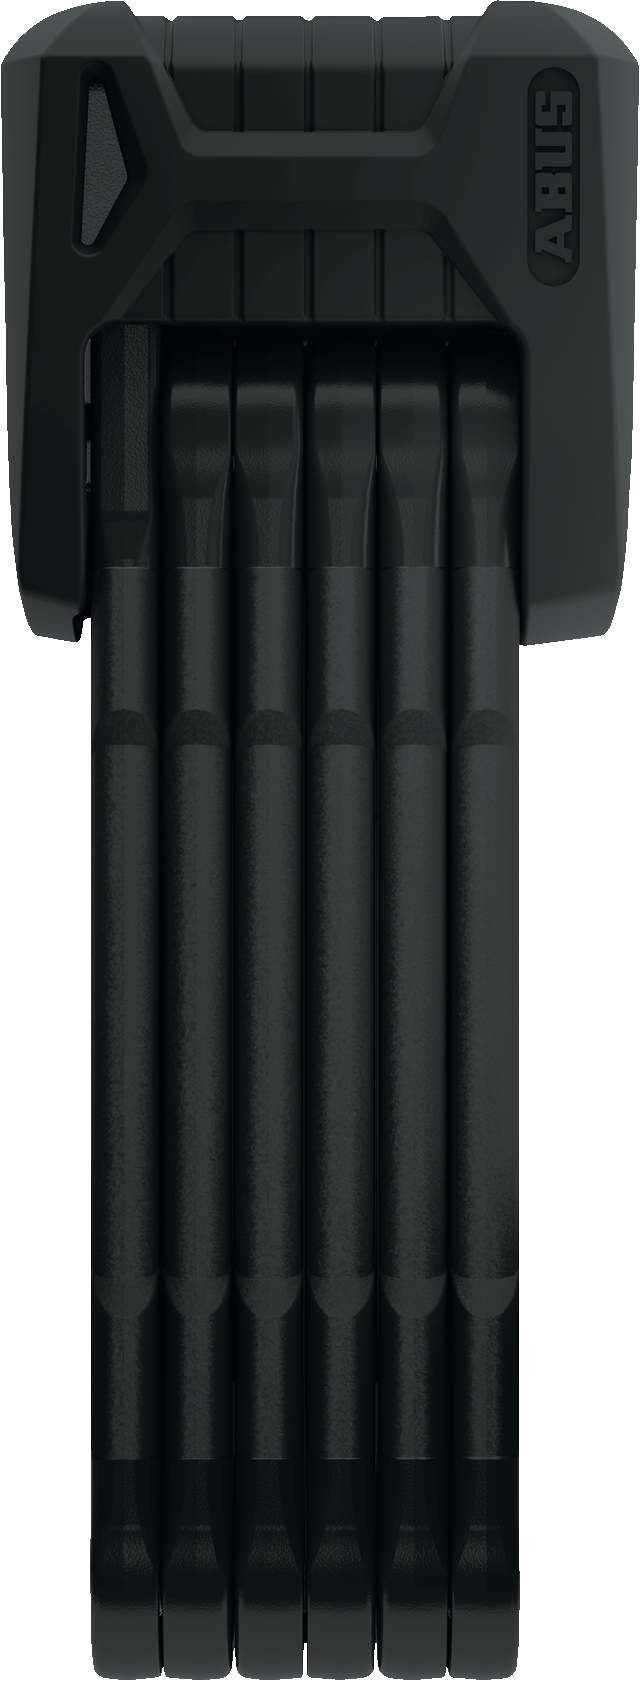 Abus Bordo Granit X-Plus™ 6500/85 Faltschloss mit SH-Halterung